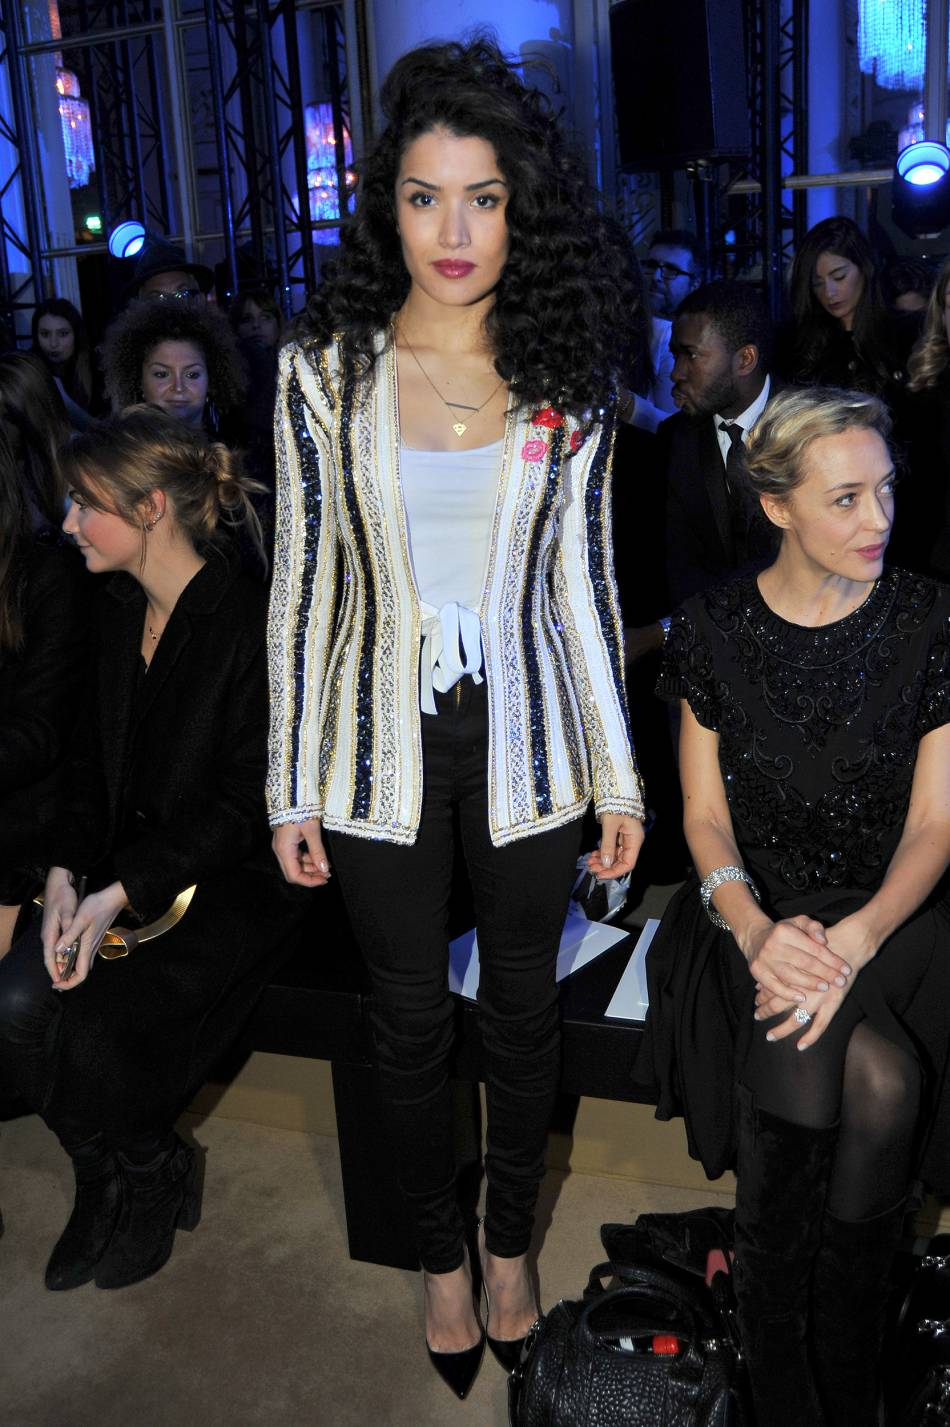 Sabrina Ouazaniau défilé Haute Couture Printemps-Été 2016Zuhair Murad.